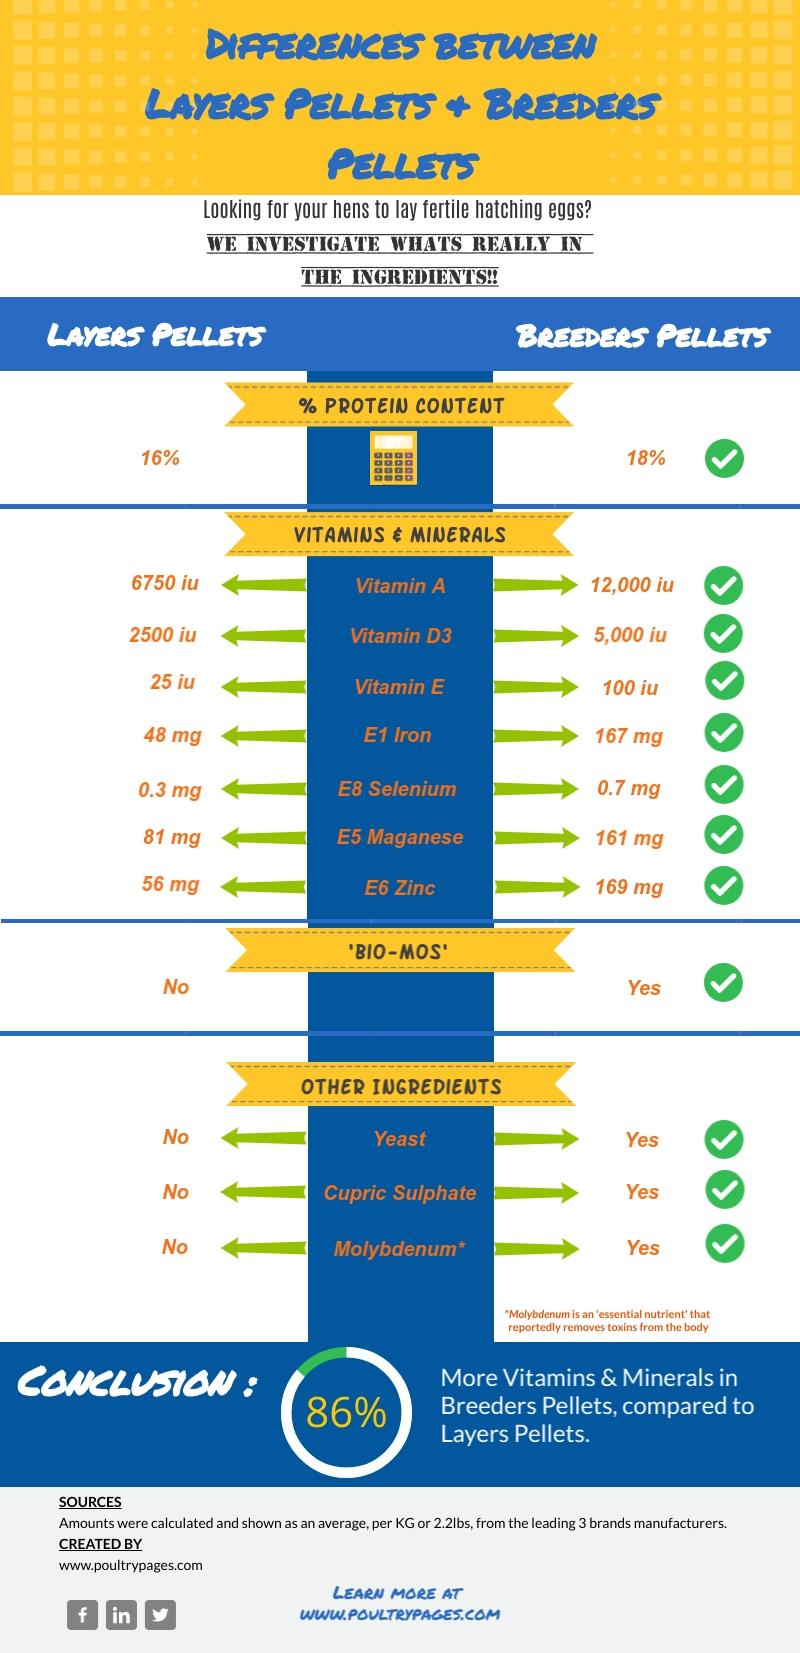 Layers pellets vs breeders pellets